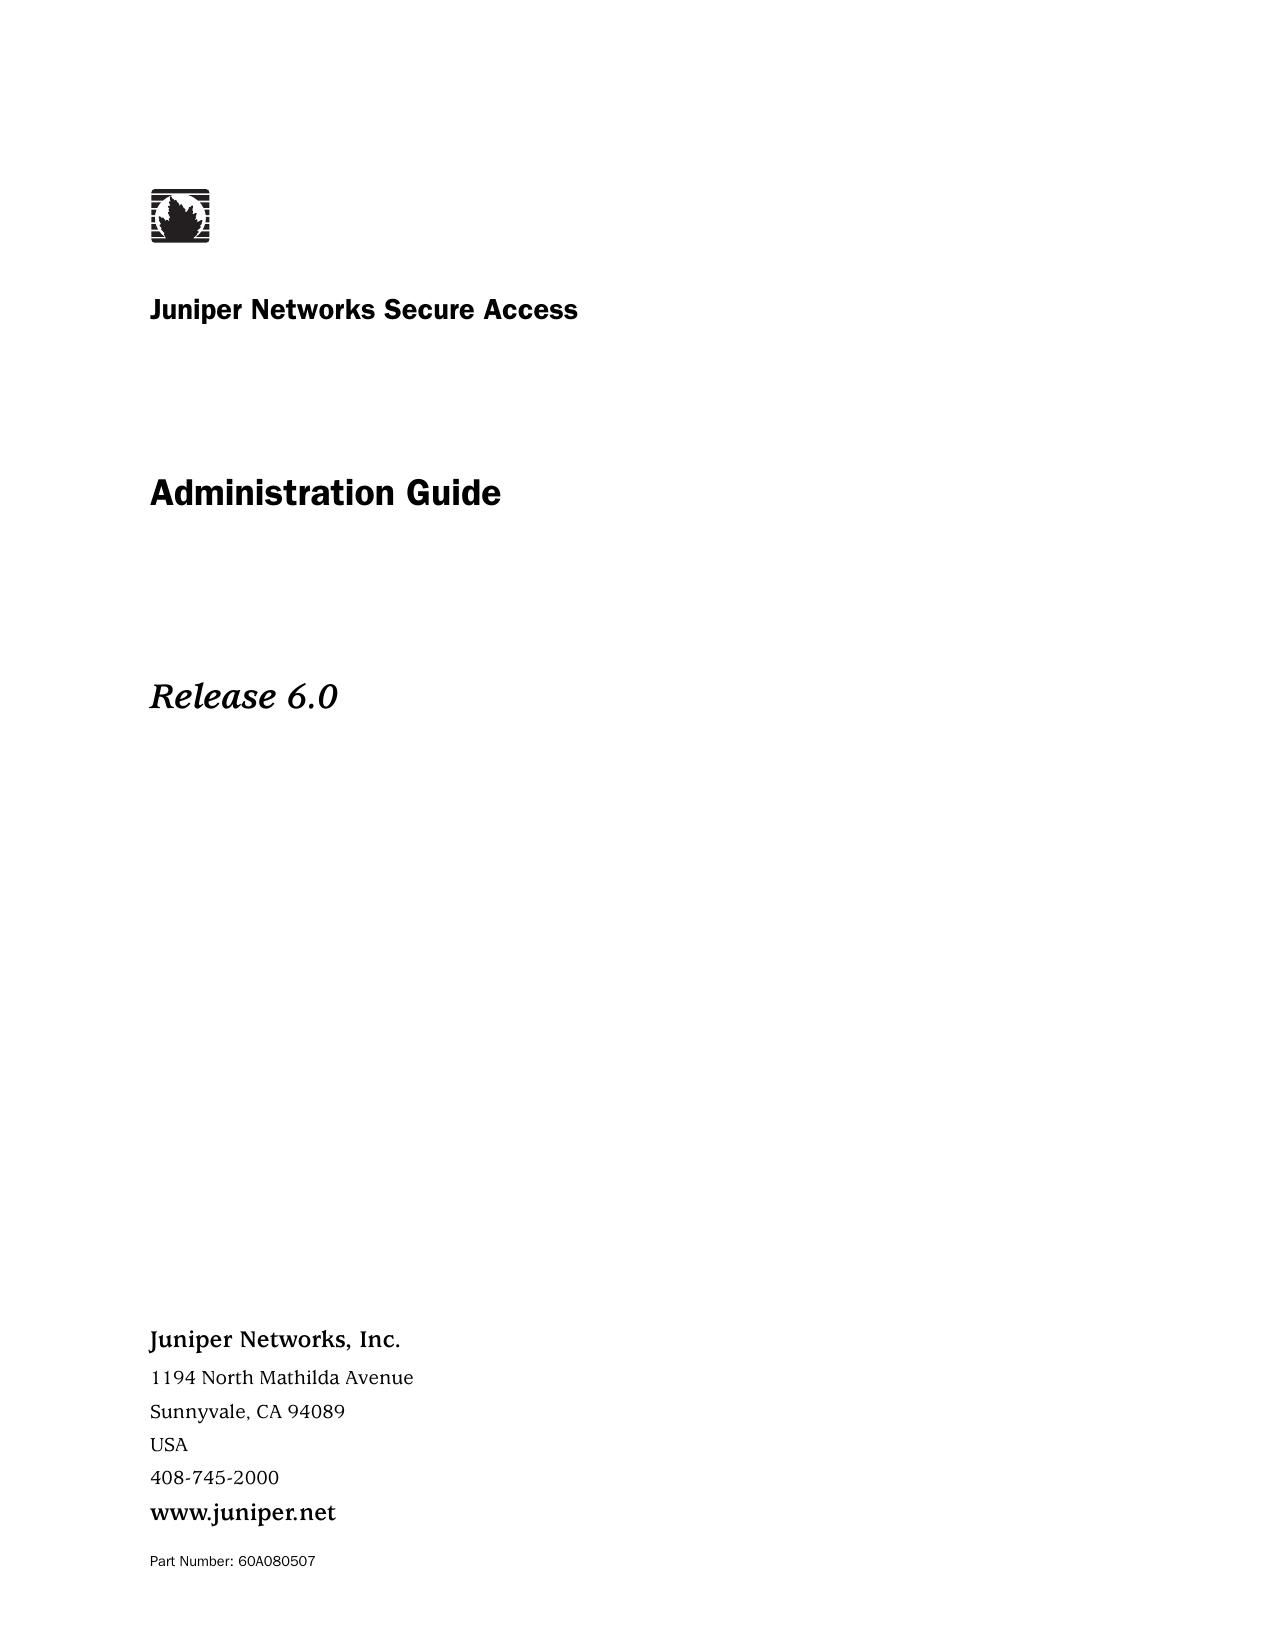 Secure Access Administration Guide | manualzz com